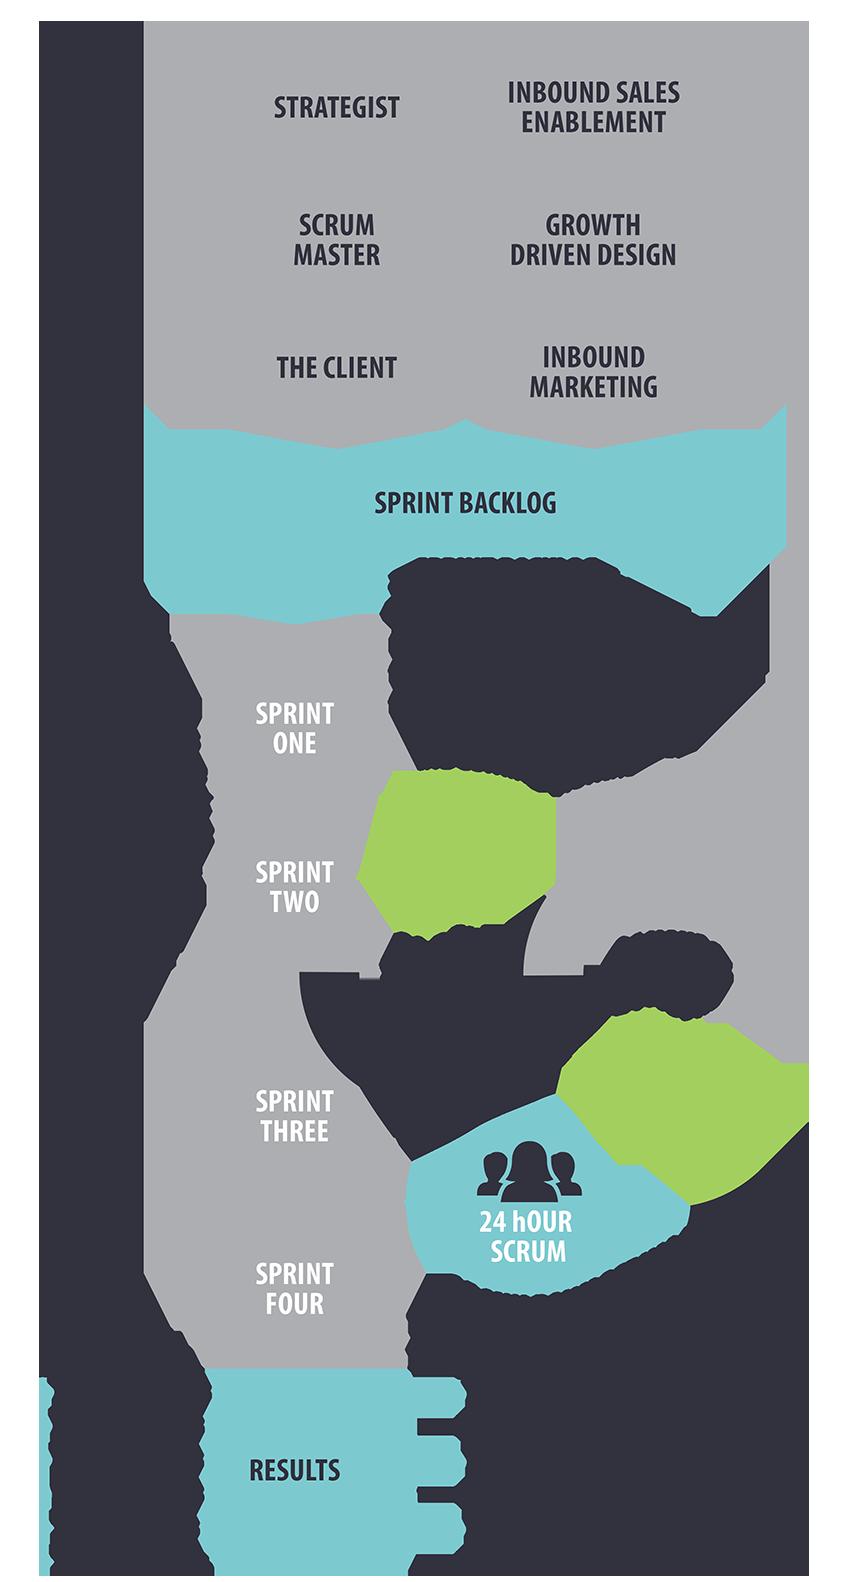 Agile Scrum Process for Inbound Marketing